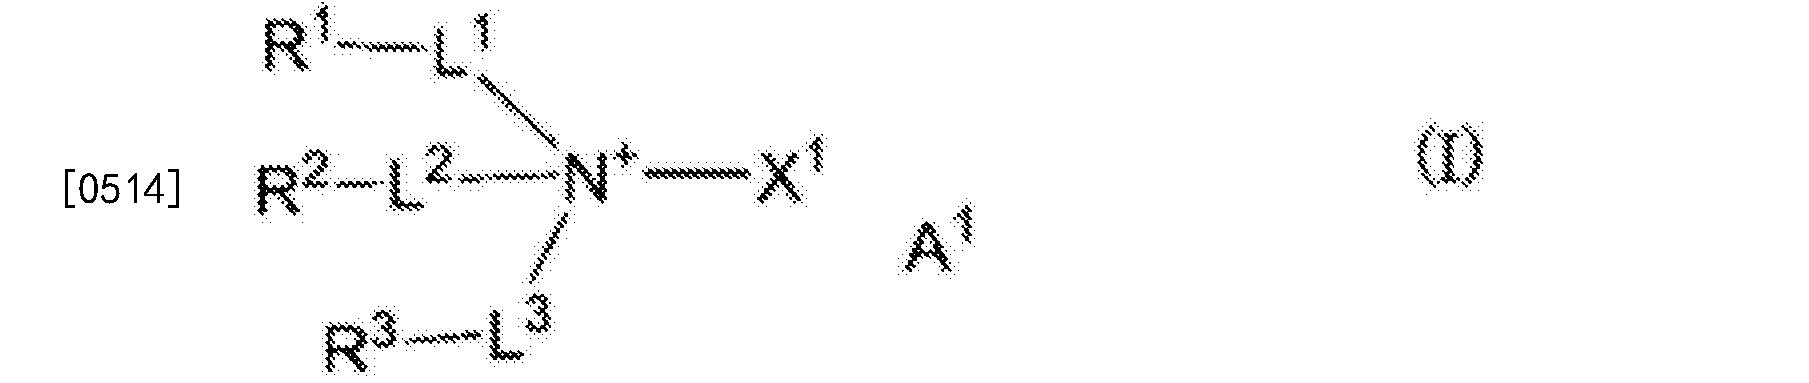 Figure CN107427531AD00722